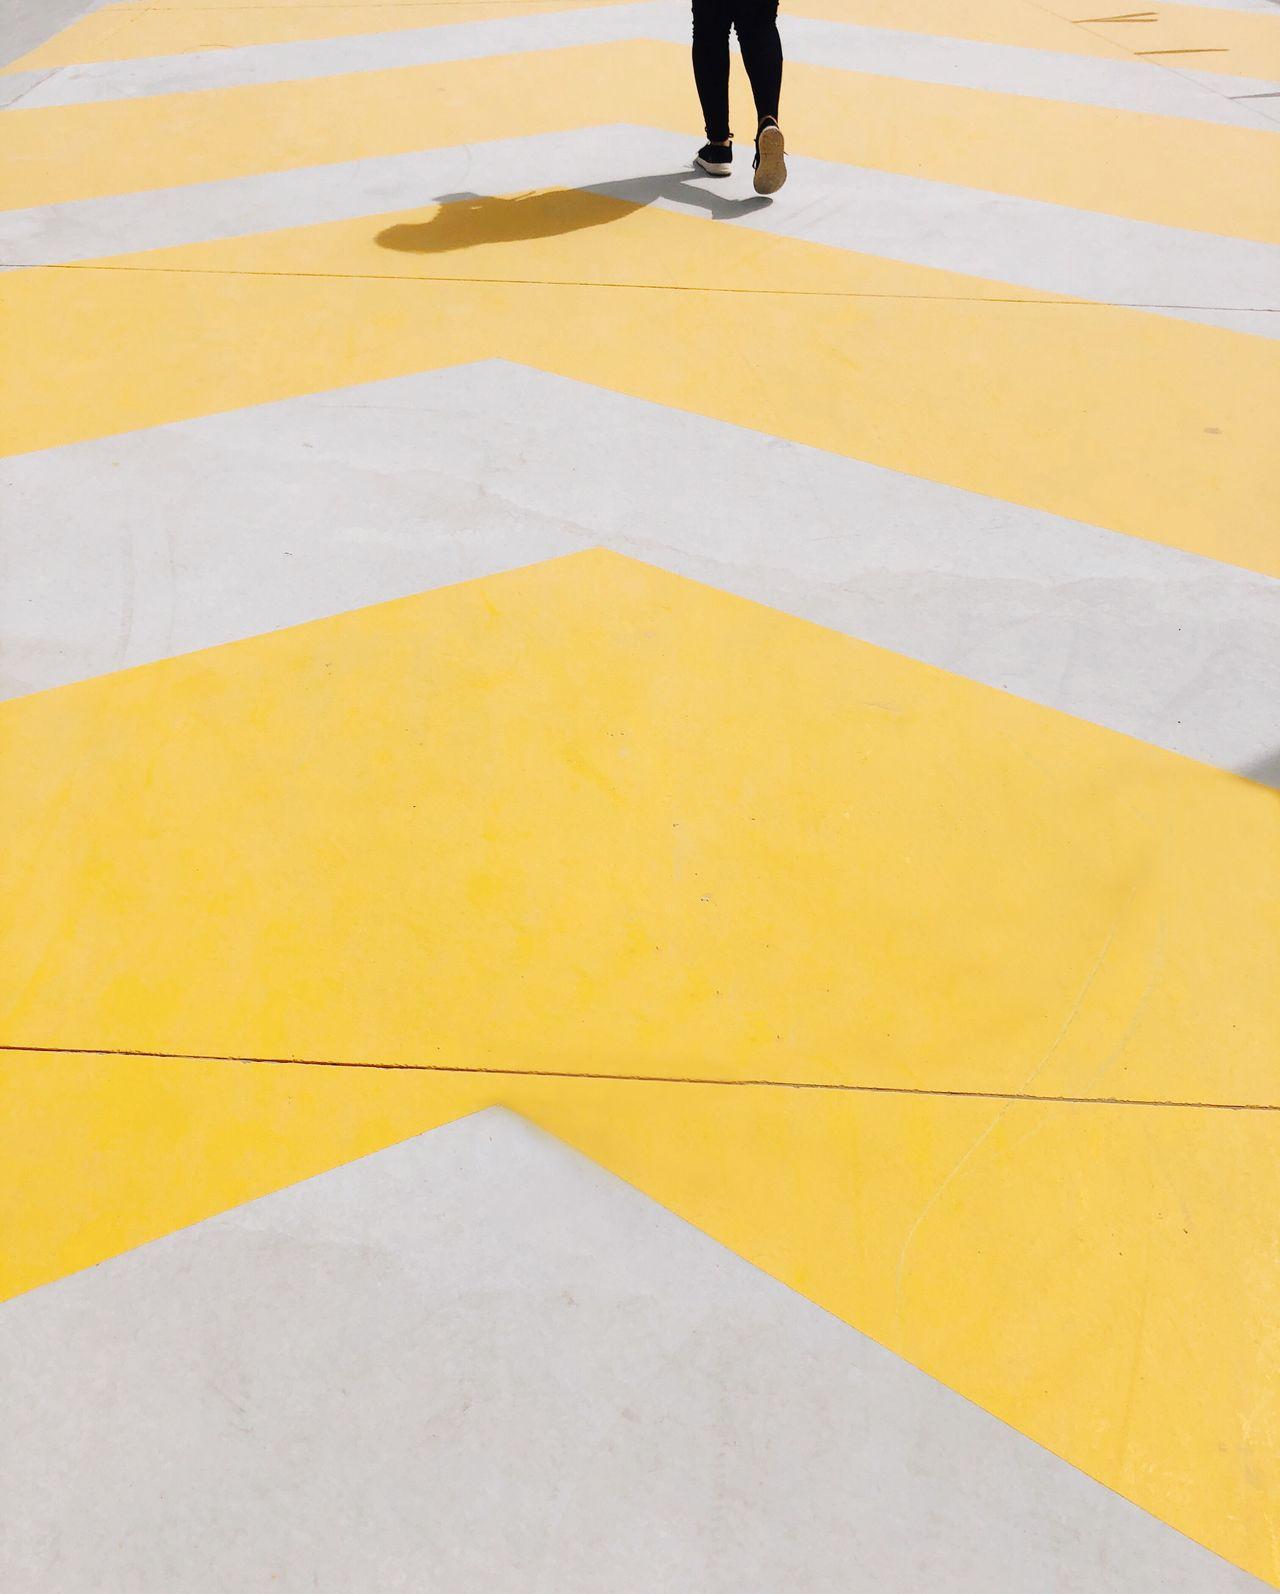 Day,  Dubai,  Human Body Part,  Human Leg,  Lifestyles